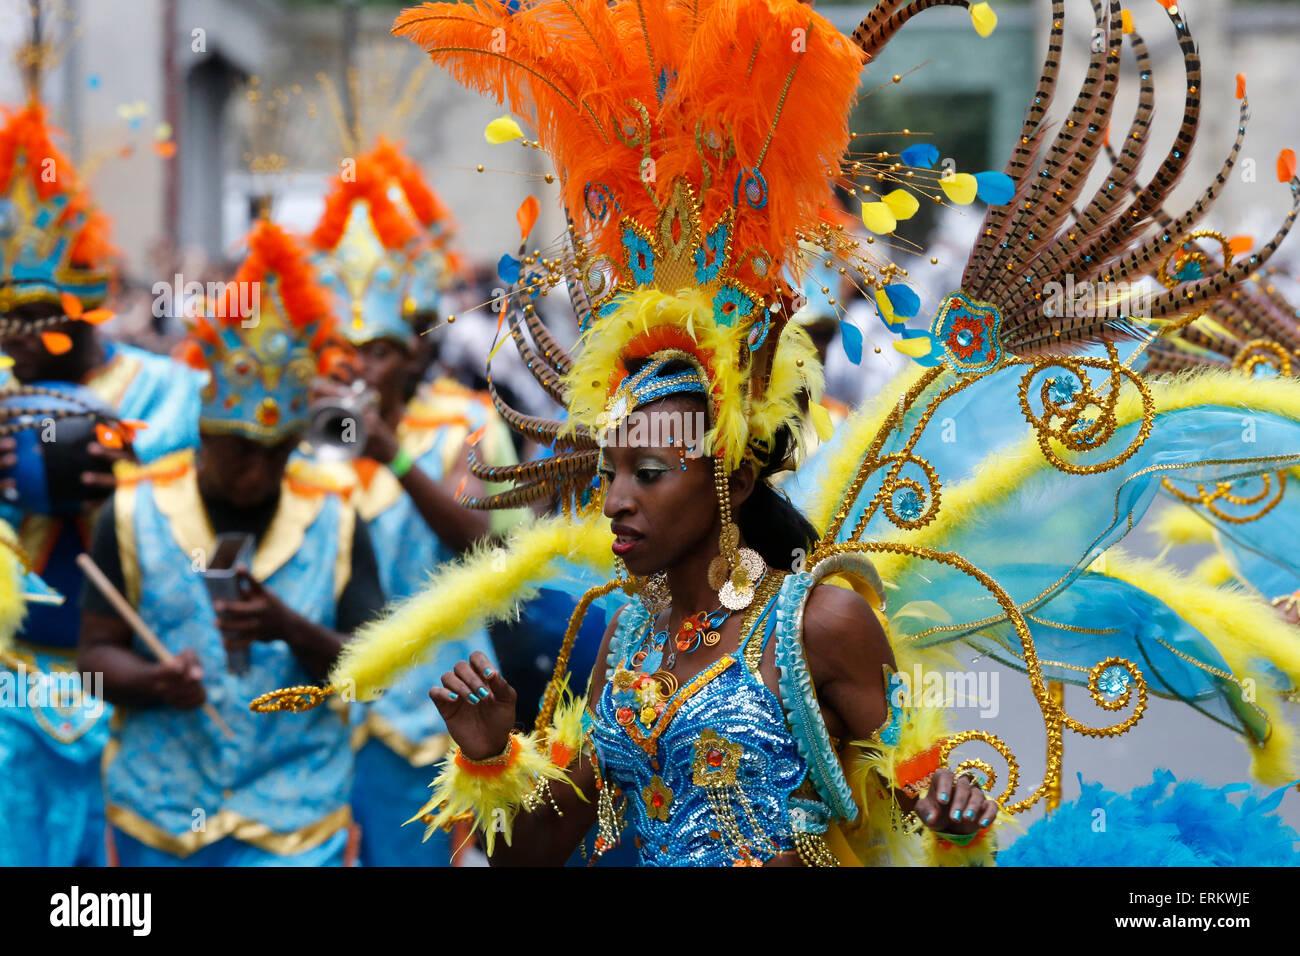 Parigi Tropical carnevale estivo, Parigi, Francia, Europa Immagini Stock